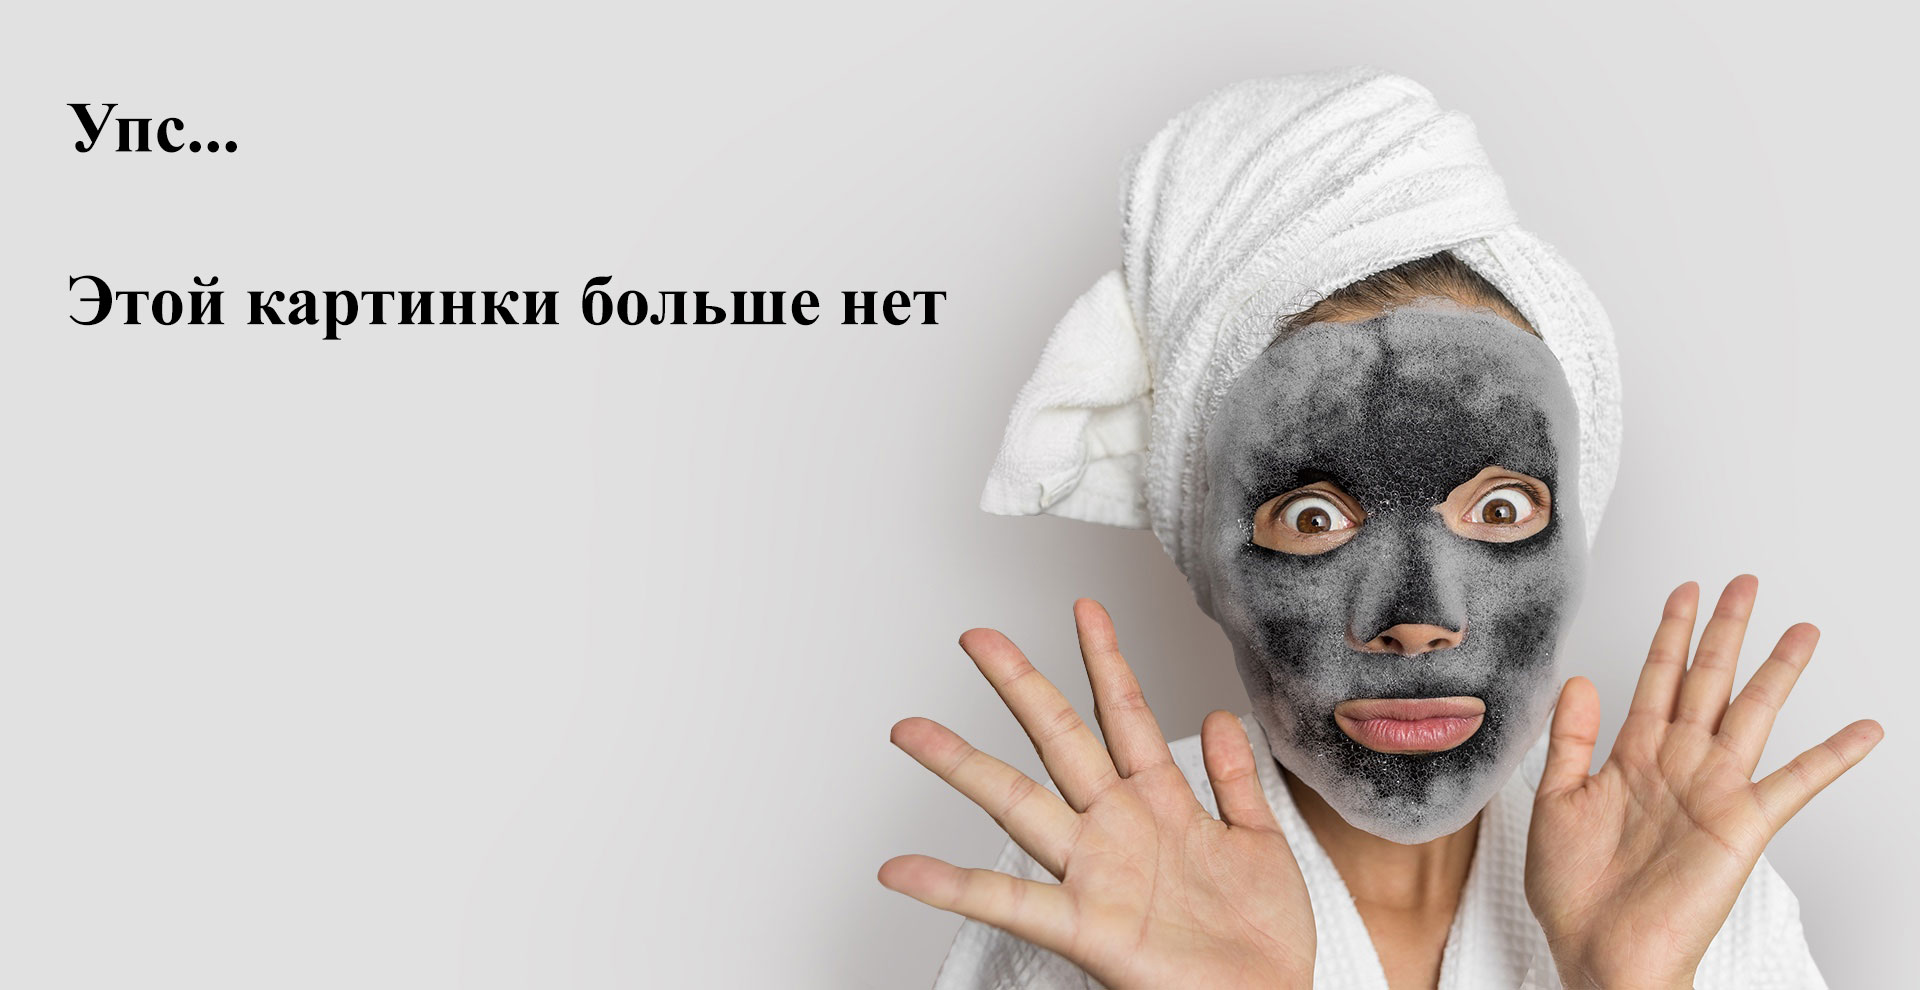 Skinlite, Маска-лифтинг для лица с коэнзимом Q-10, 1 шт